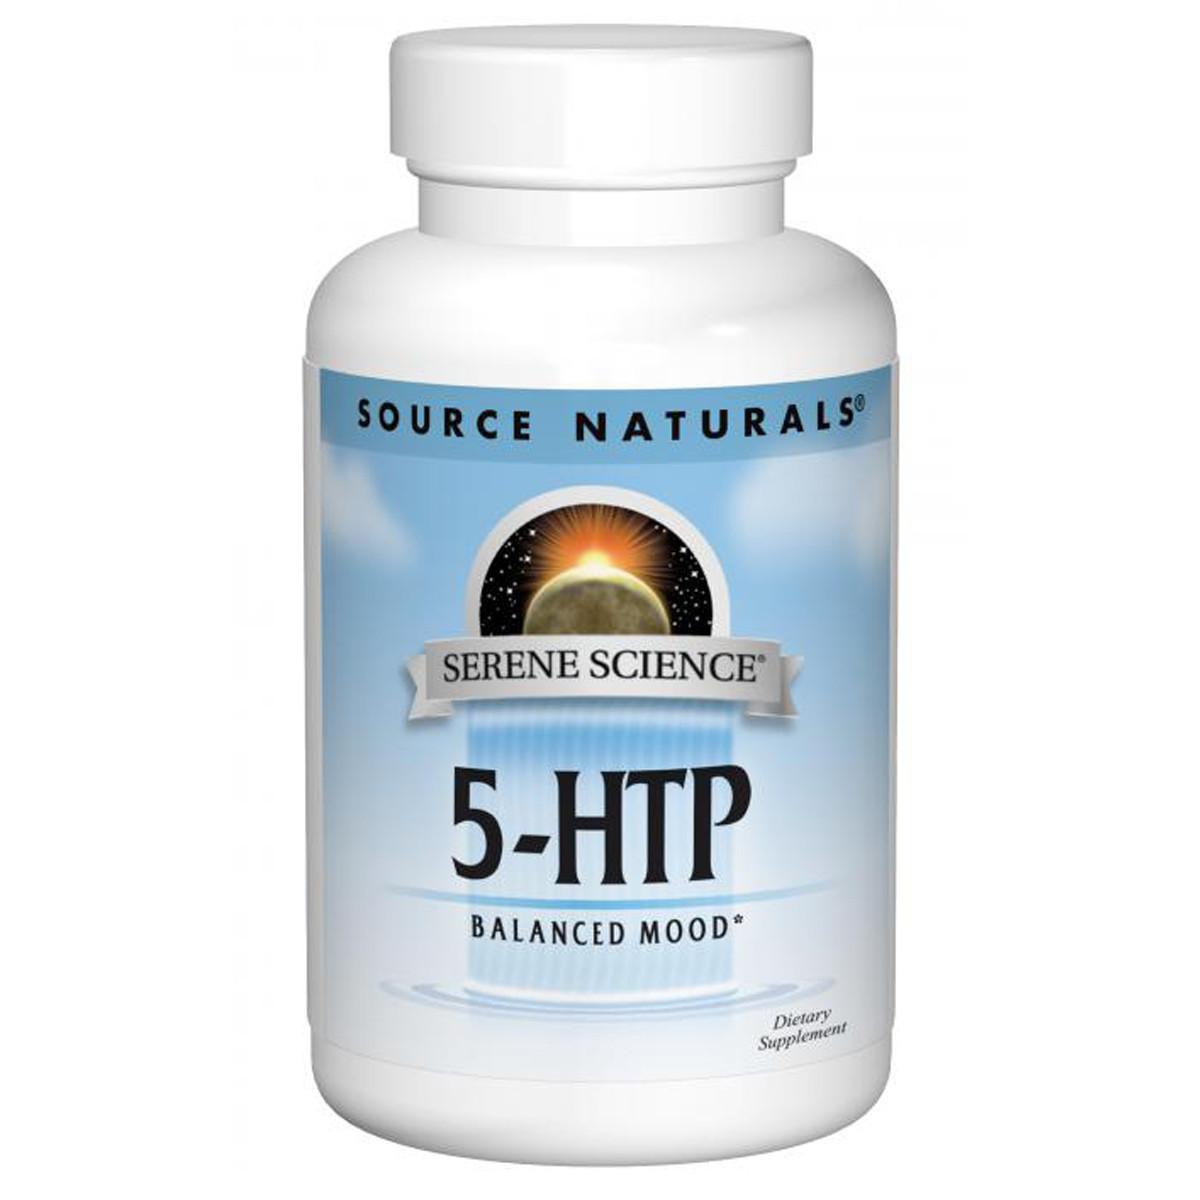 5-HTP (Гидрокситриптофан), 50 мг, Serene Science, Source Naturals, 30 желатиновых капсул